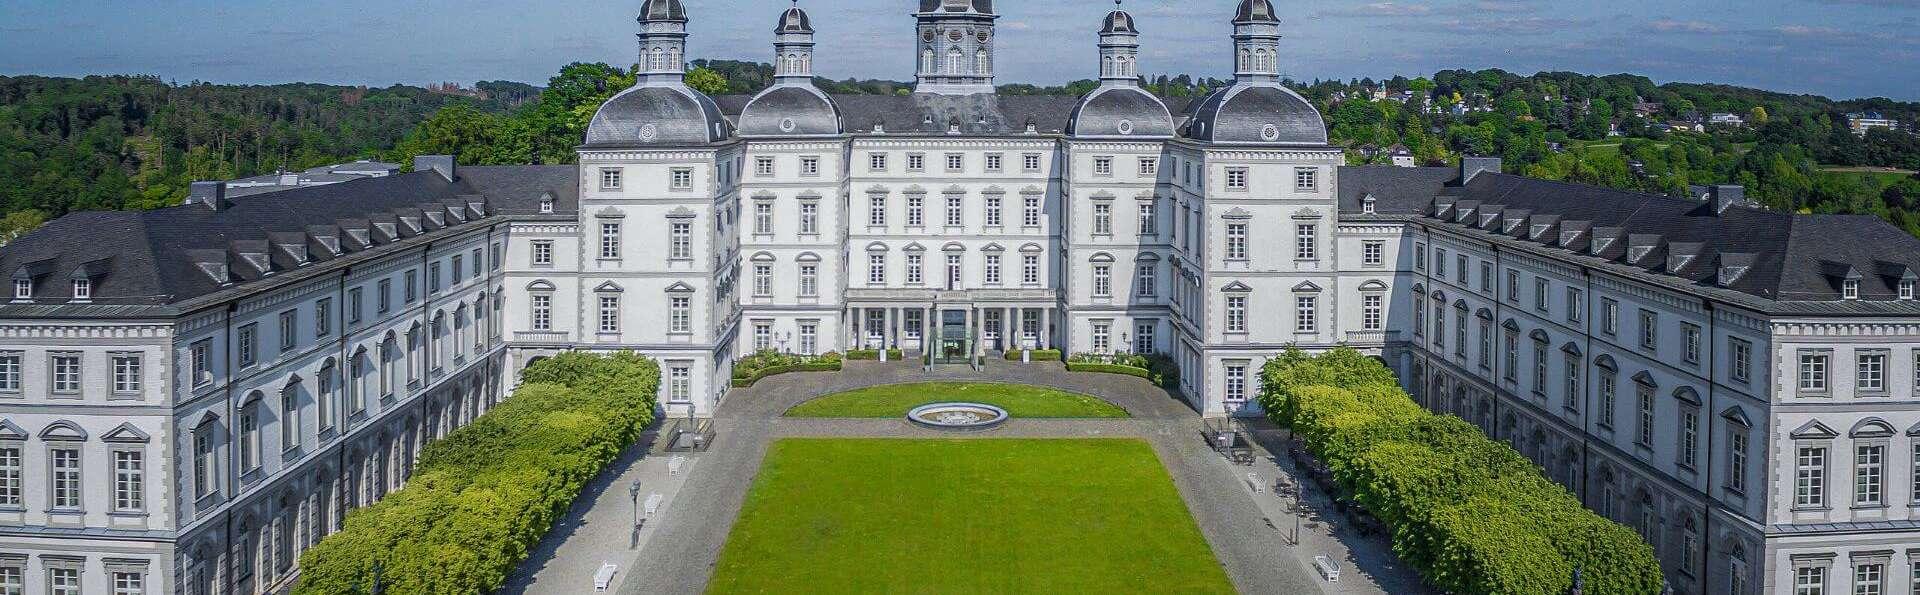 Althoff Grandhotel Schloss Bensberg - EDIT_Althoff-Grandhotel-Schloss-Bensberg.jpg